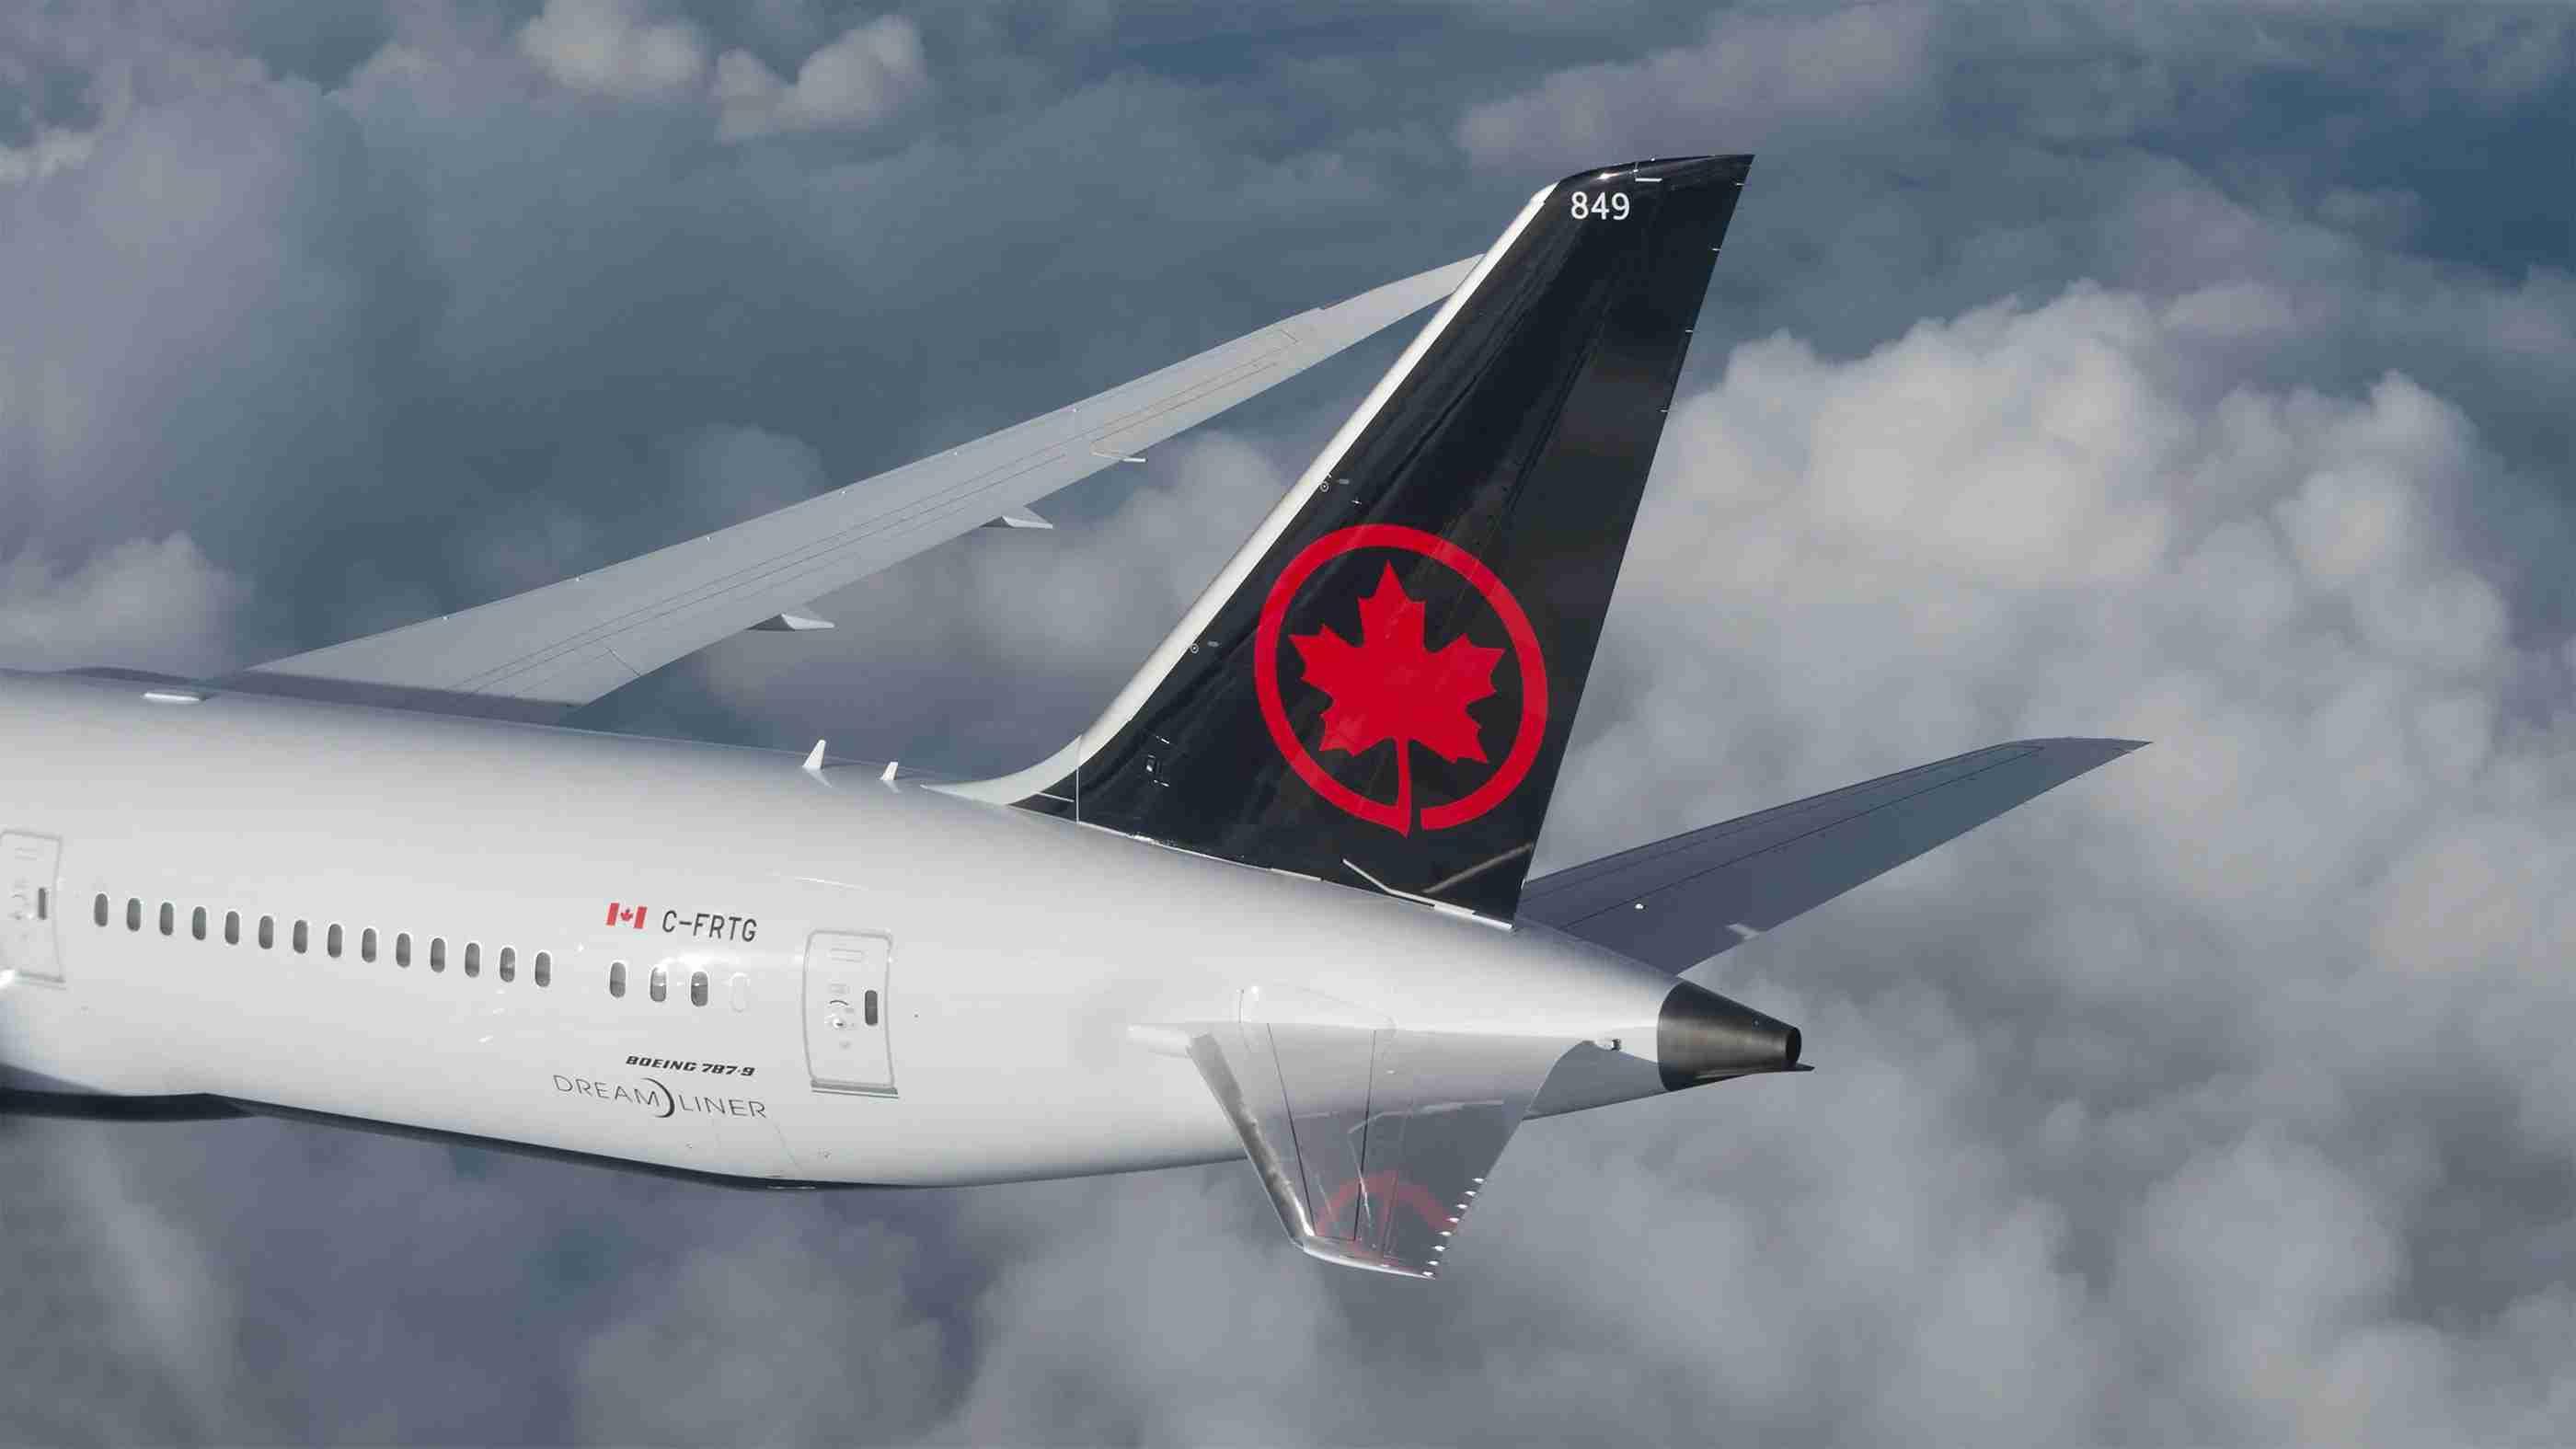 Photo courtesy of Air Canada.